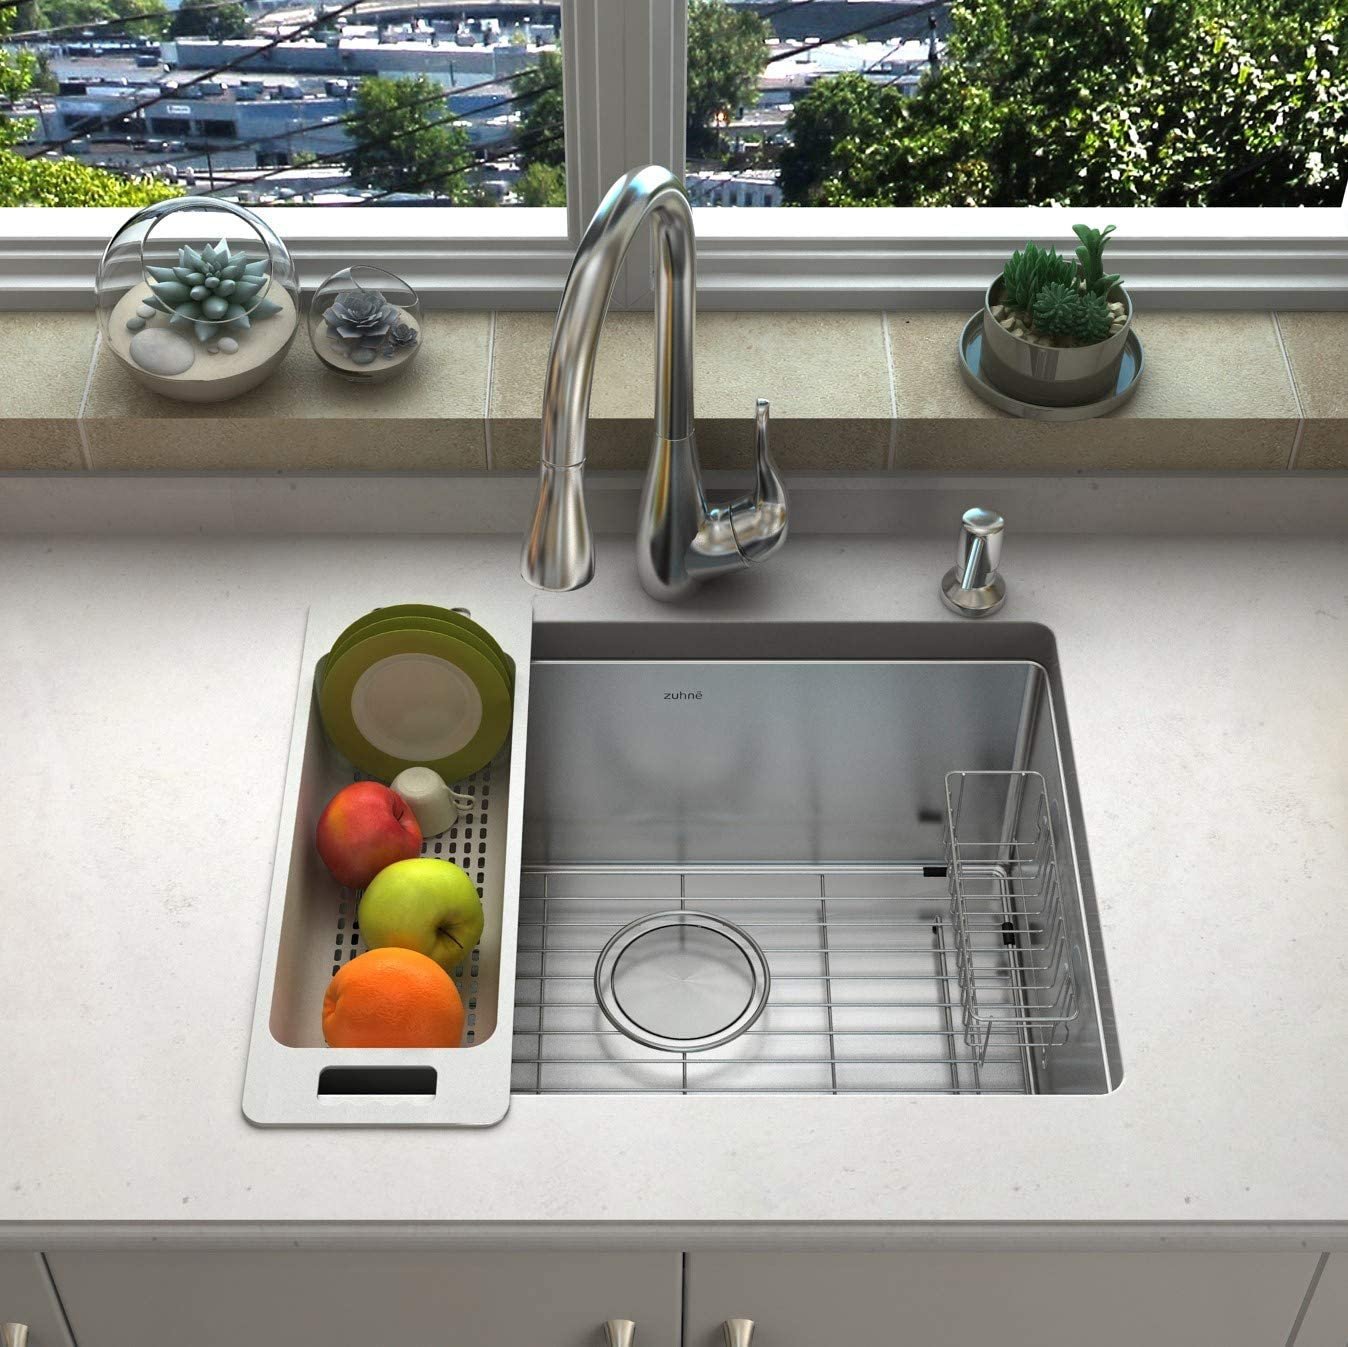 zuhne 21 inch undermount single bowl 16 gauge stainless steel kitchen sink for 24 inch cabinet open box